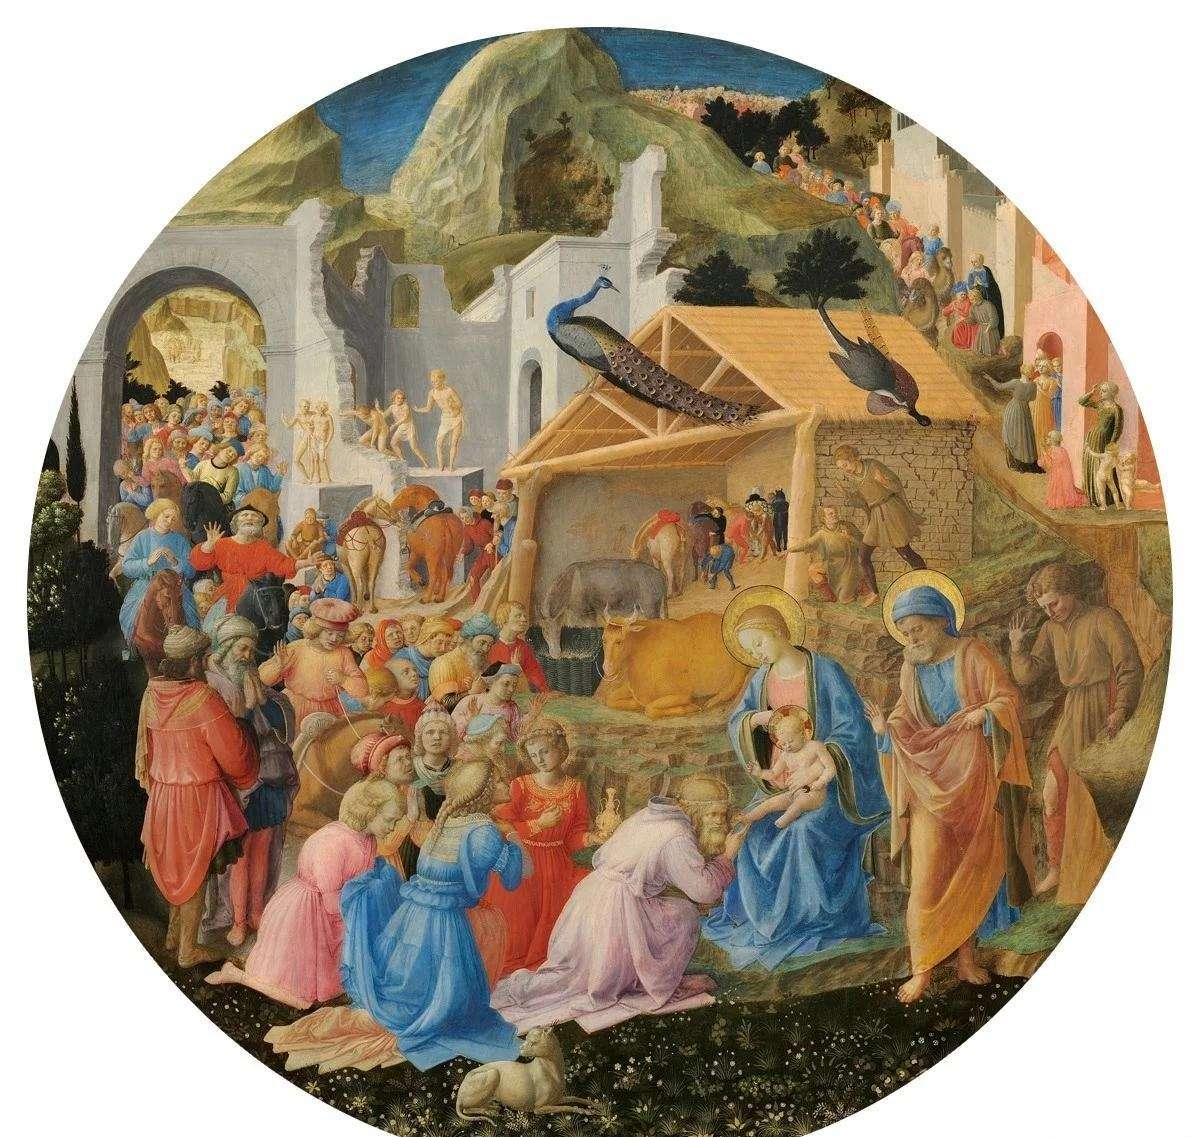 97 12 c35 862 - حیوانات در تابلوهای نقاشی قرون وسطا چه مفهومی داشتند؟